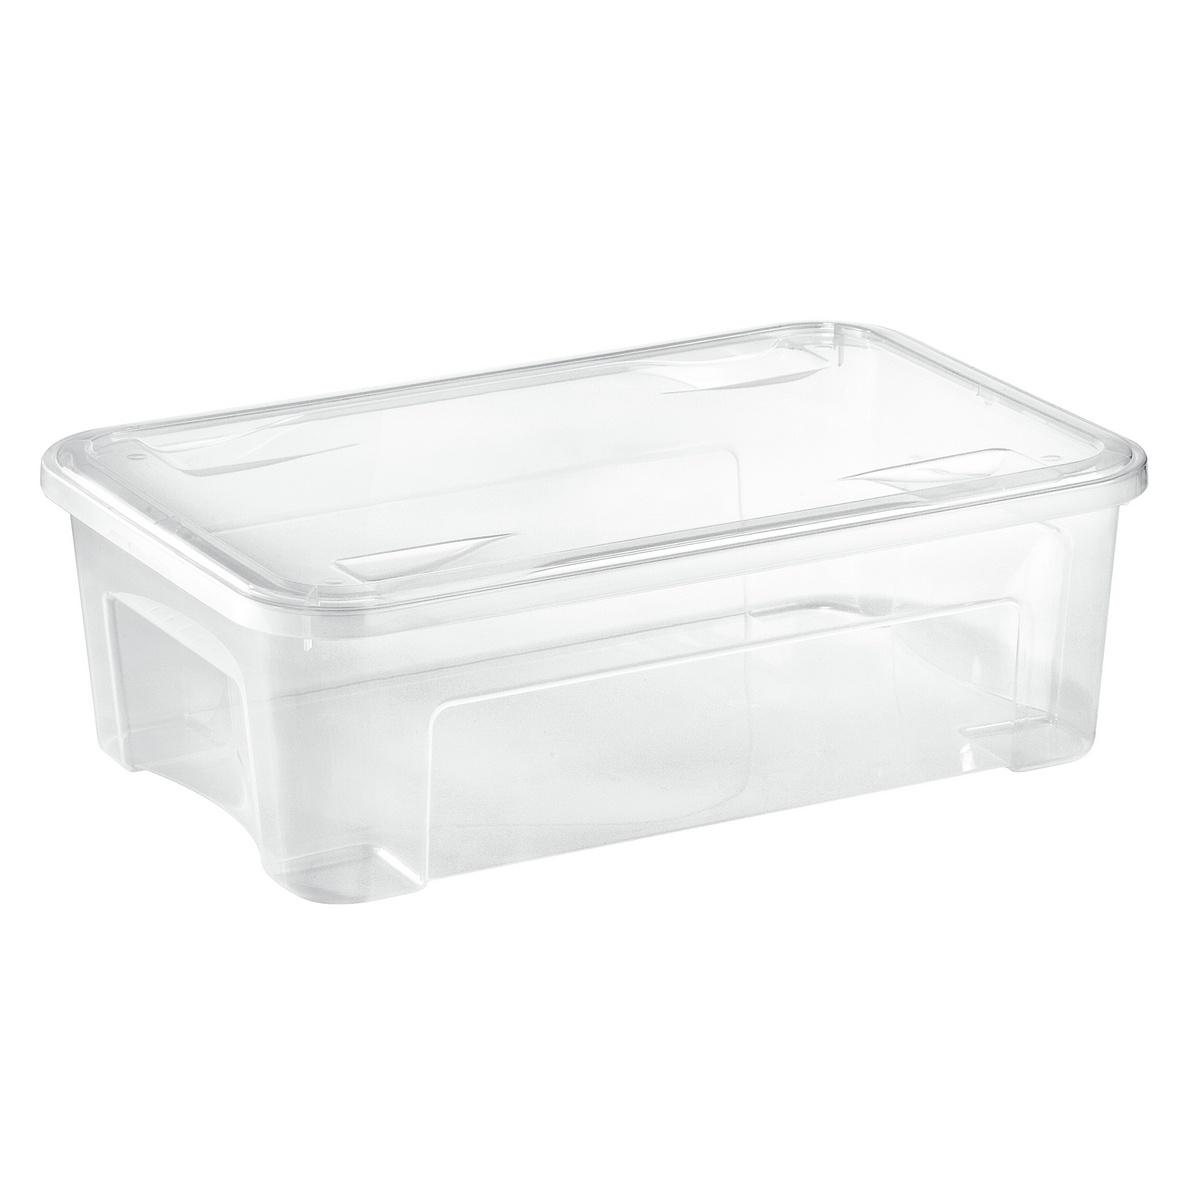 Tontarelli Úložný Combi box s víkem 29,5 l, transparentní